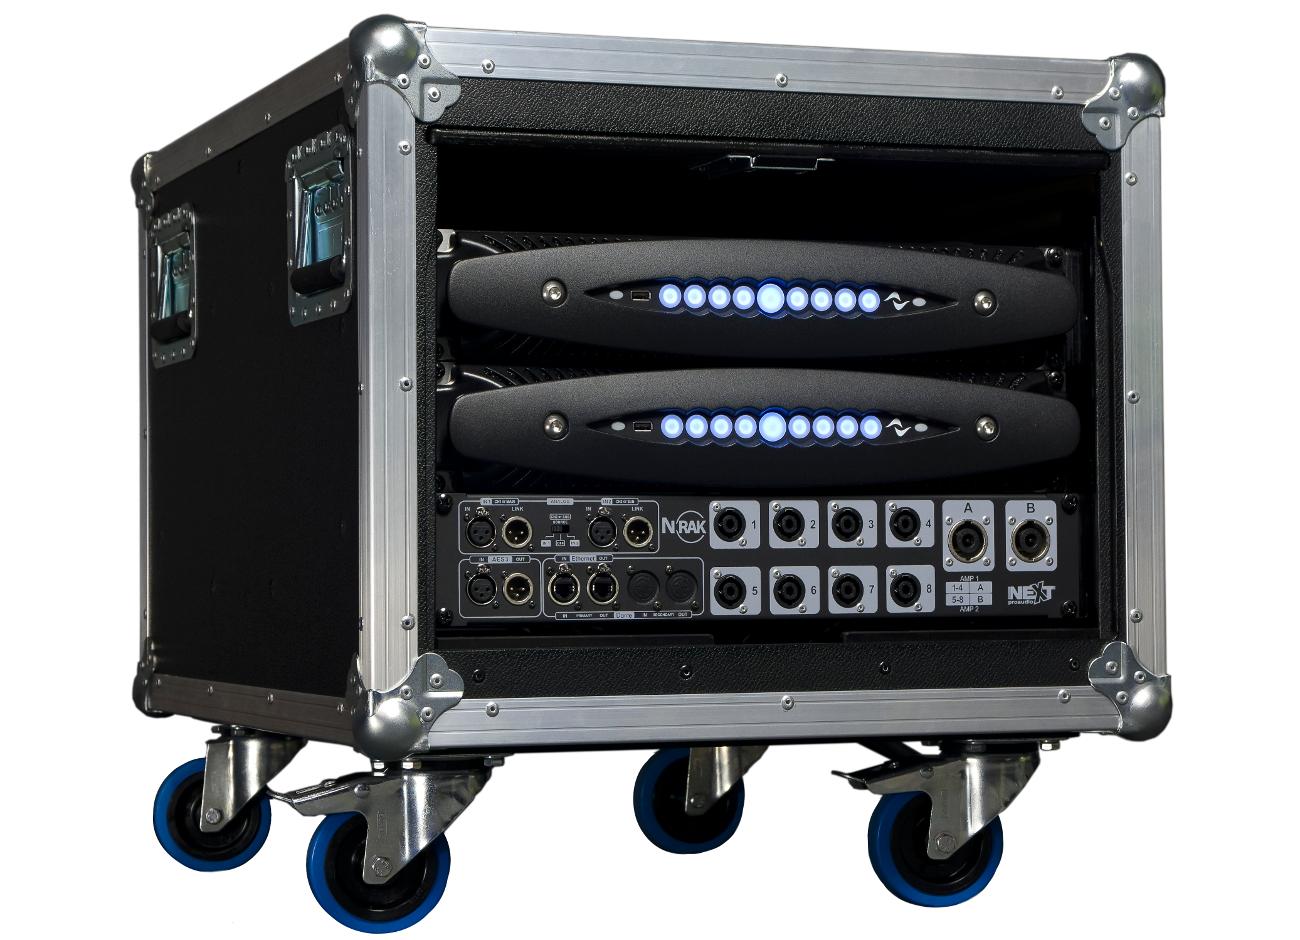 News: NEXT-proaudio präsentiert vereinheitlichtes Schnittstellen-Rack N-RAK